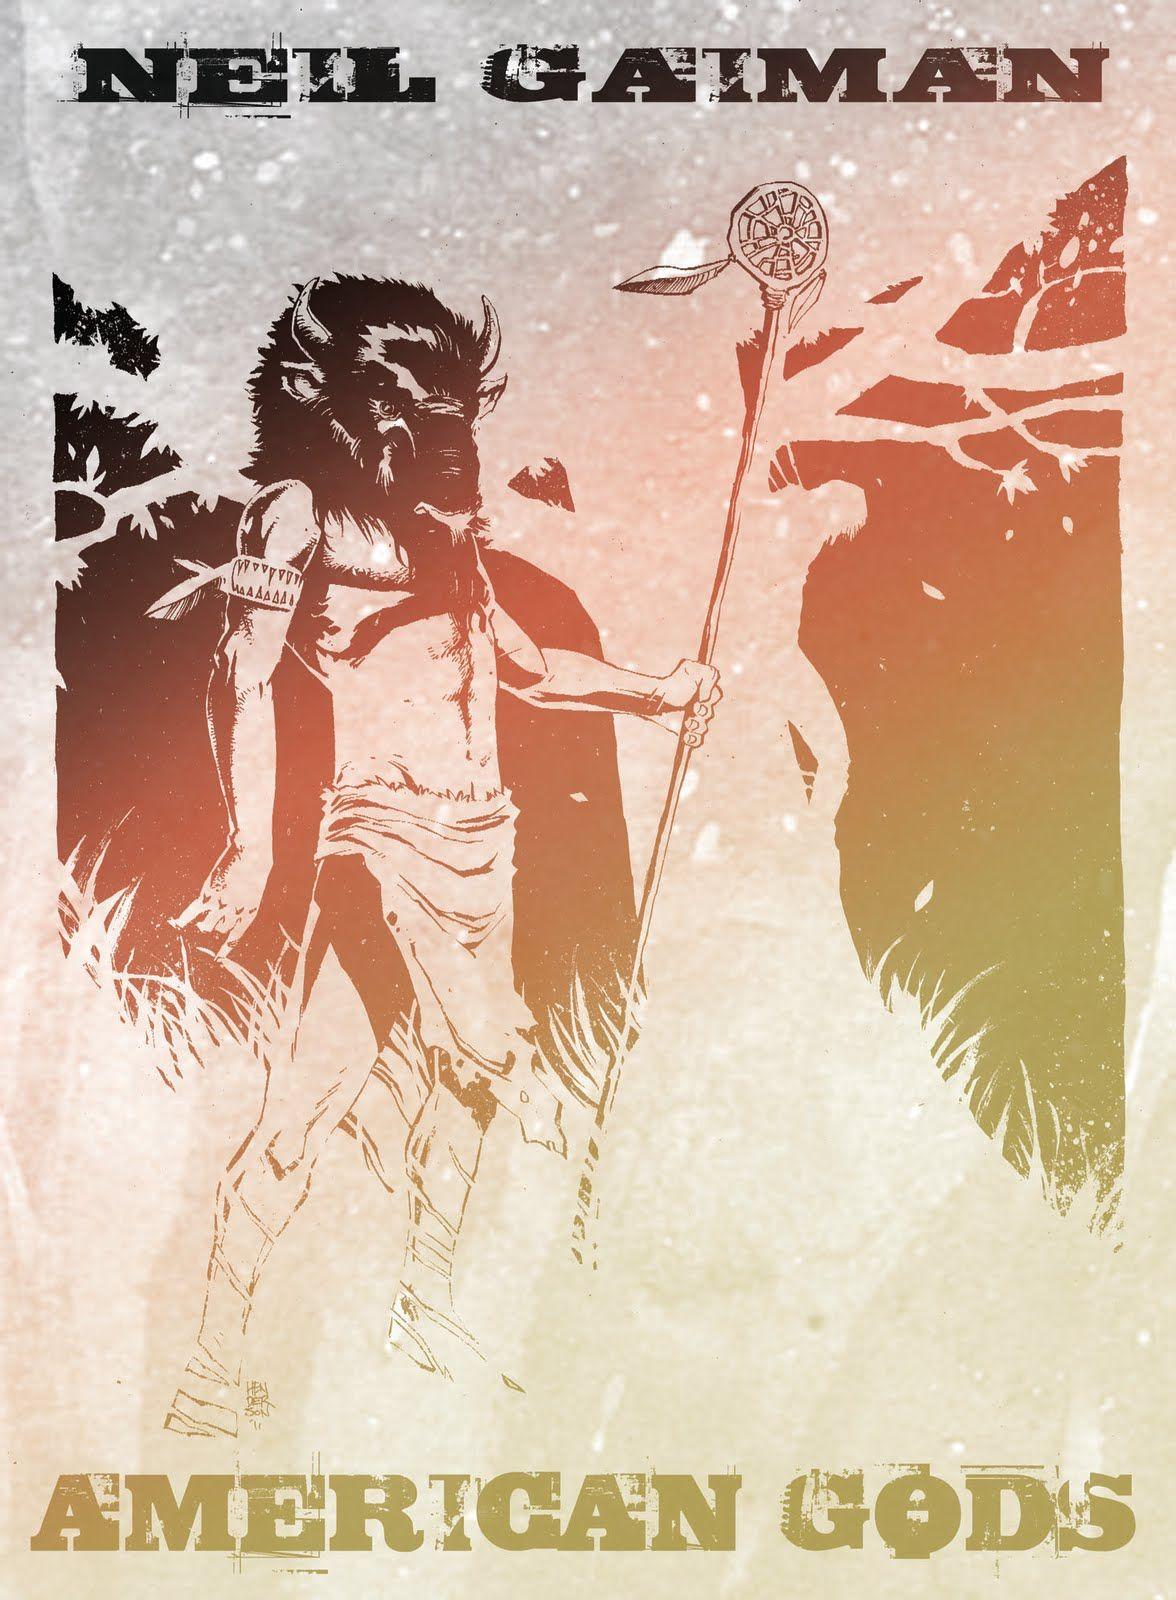 Super Punch: Art inspired by Neil Gaiman's American Gods